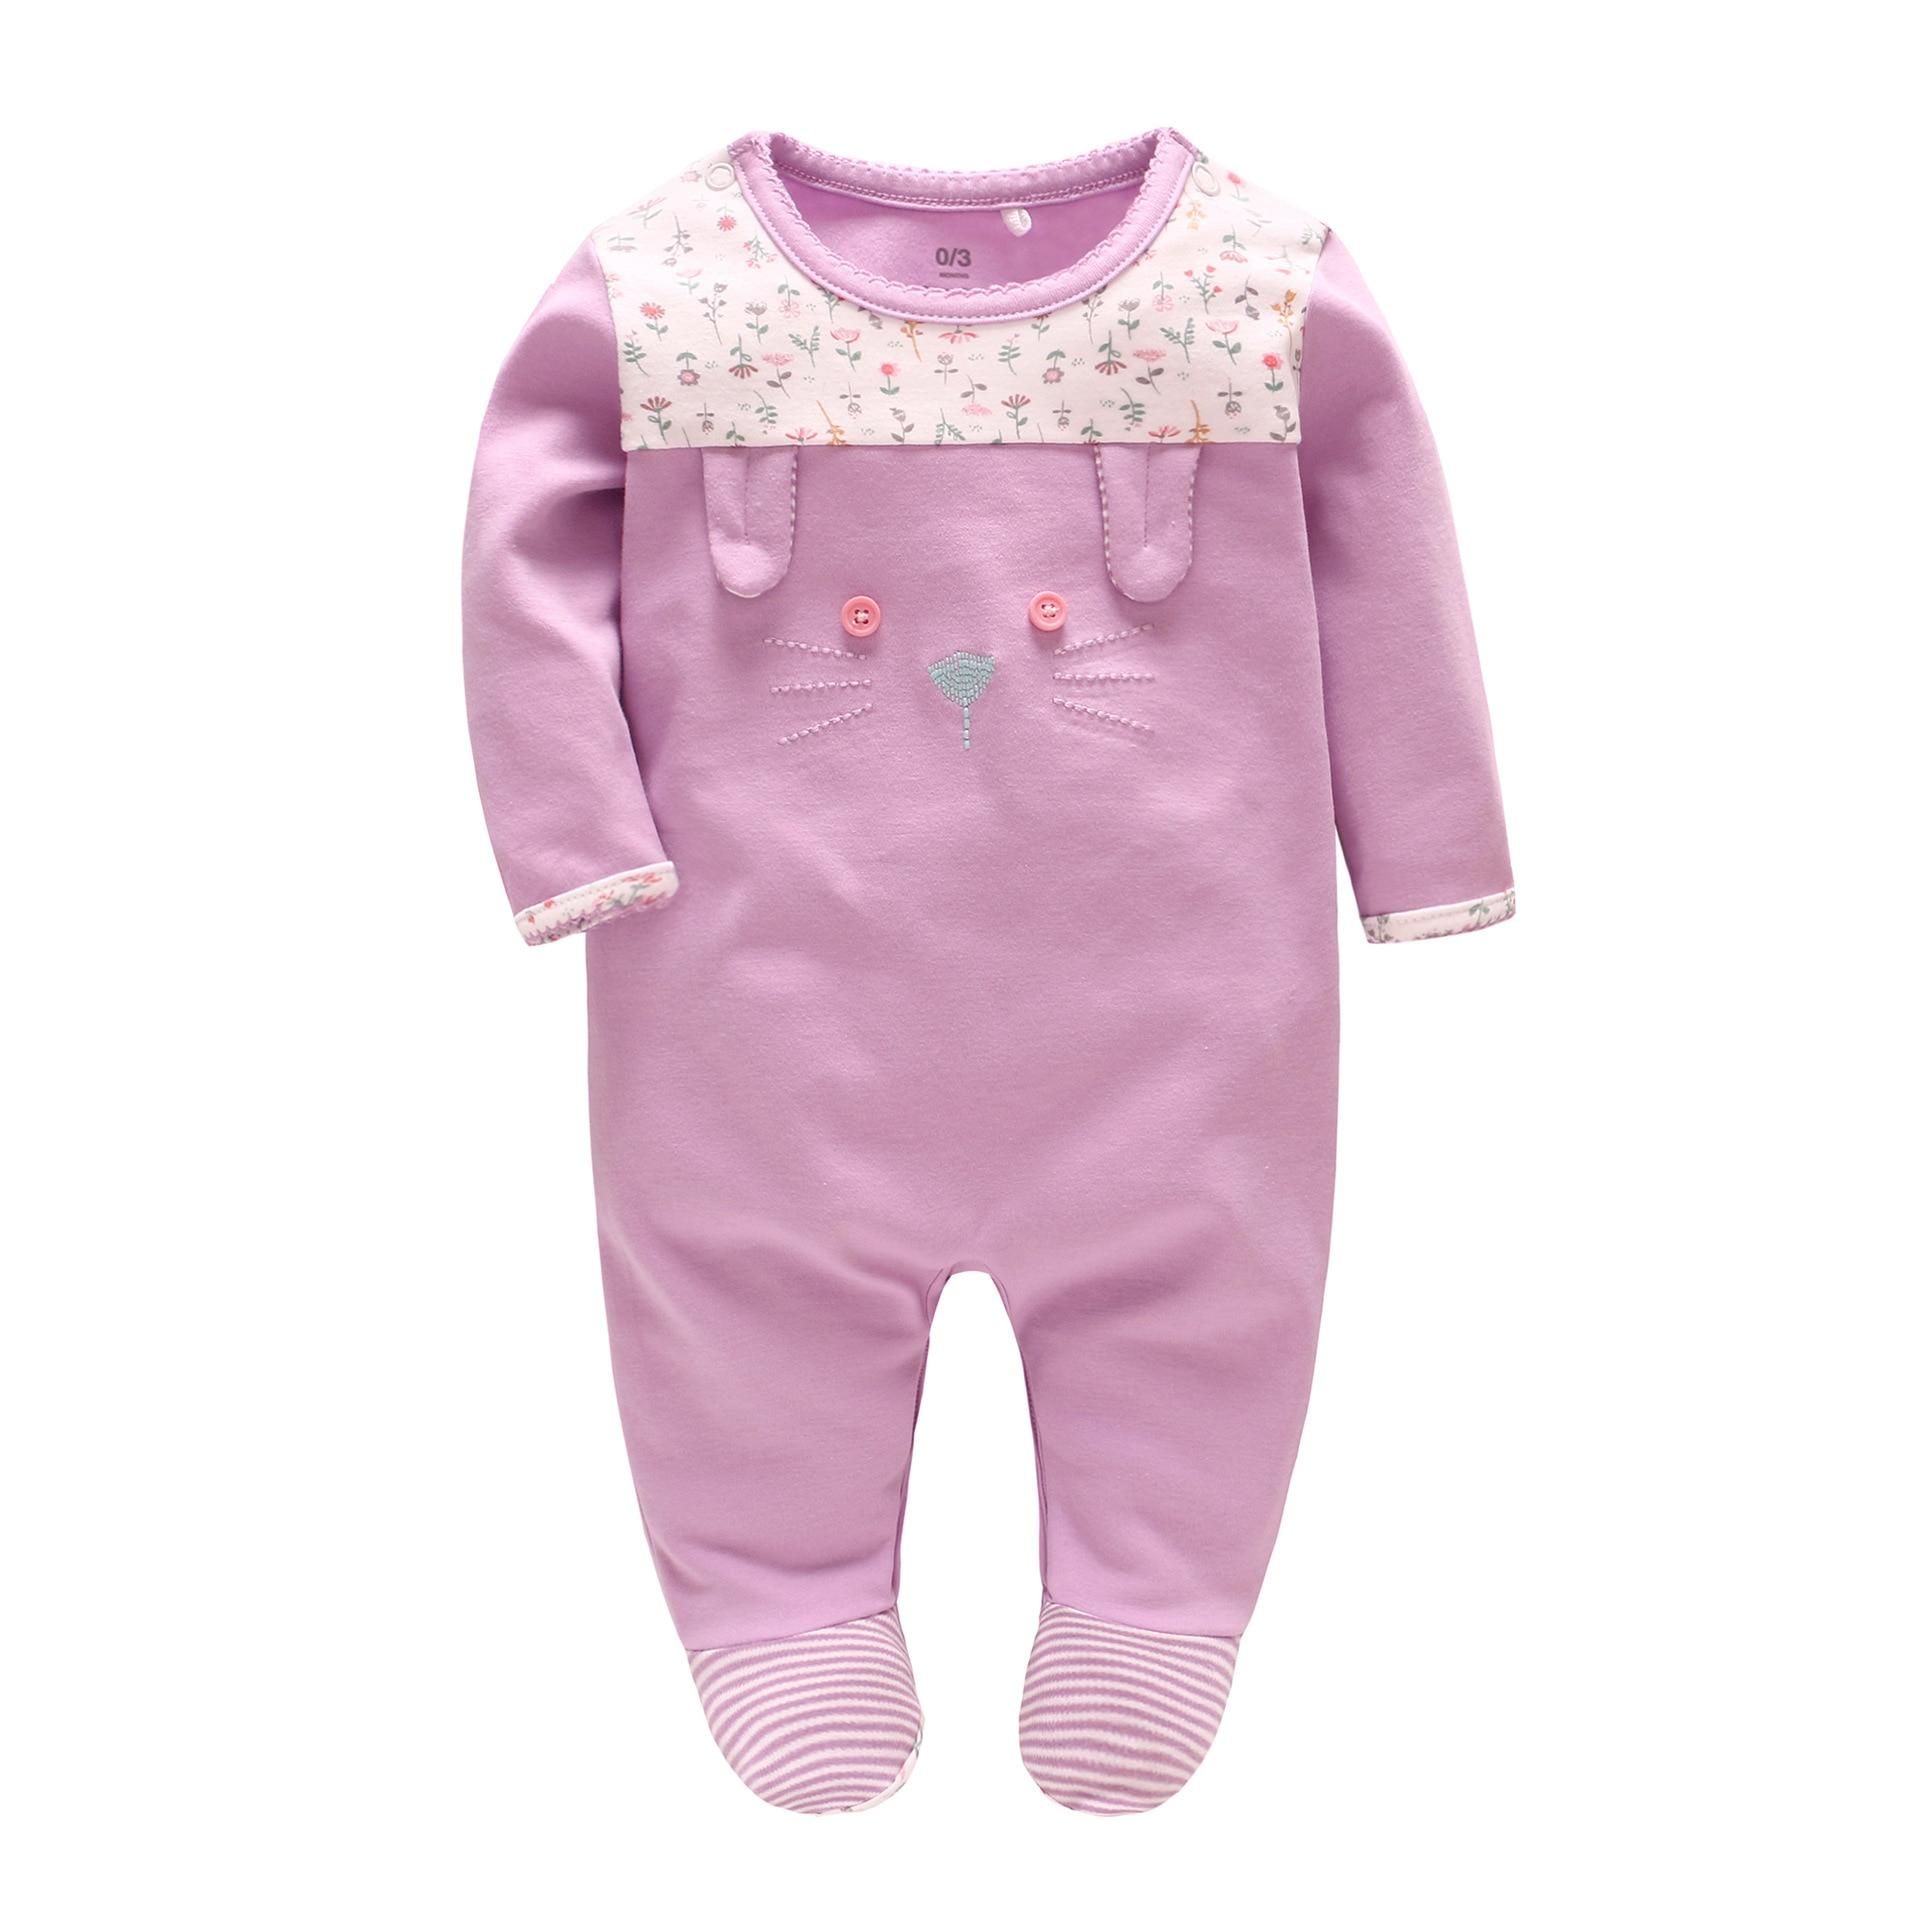 Vlinder 2018 ropa de bebé para niños ropa de bebé niña ajustada mono de manga larga de algodón de gato lindo primavera otoño pijamas infantiles